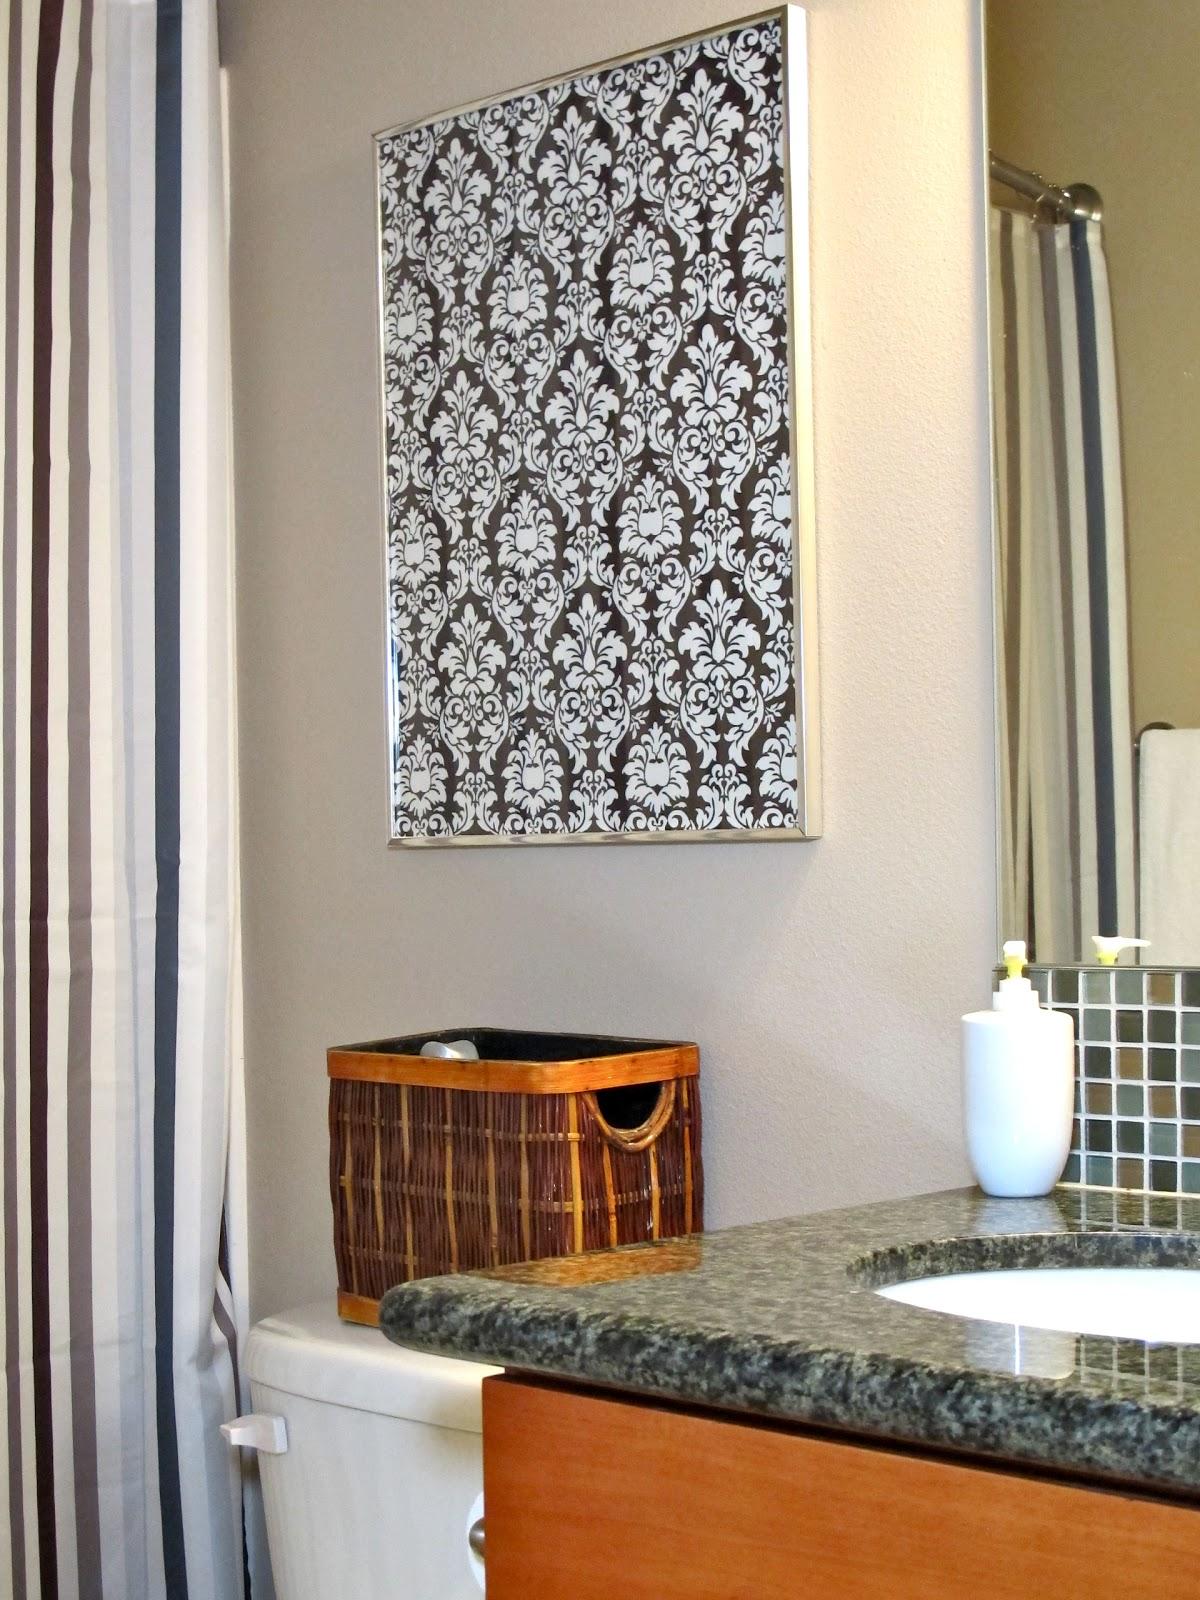 BluKatKraft: DIY Quick Easy Wall Art For Bathroom